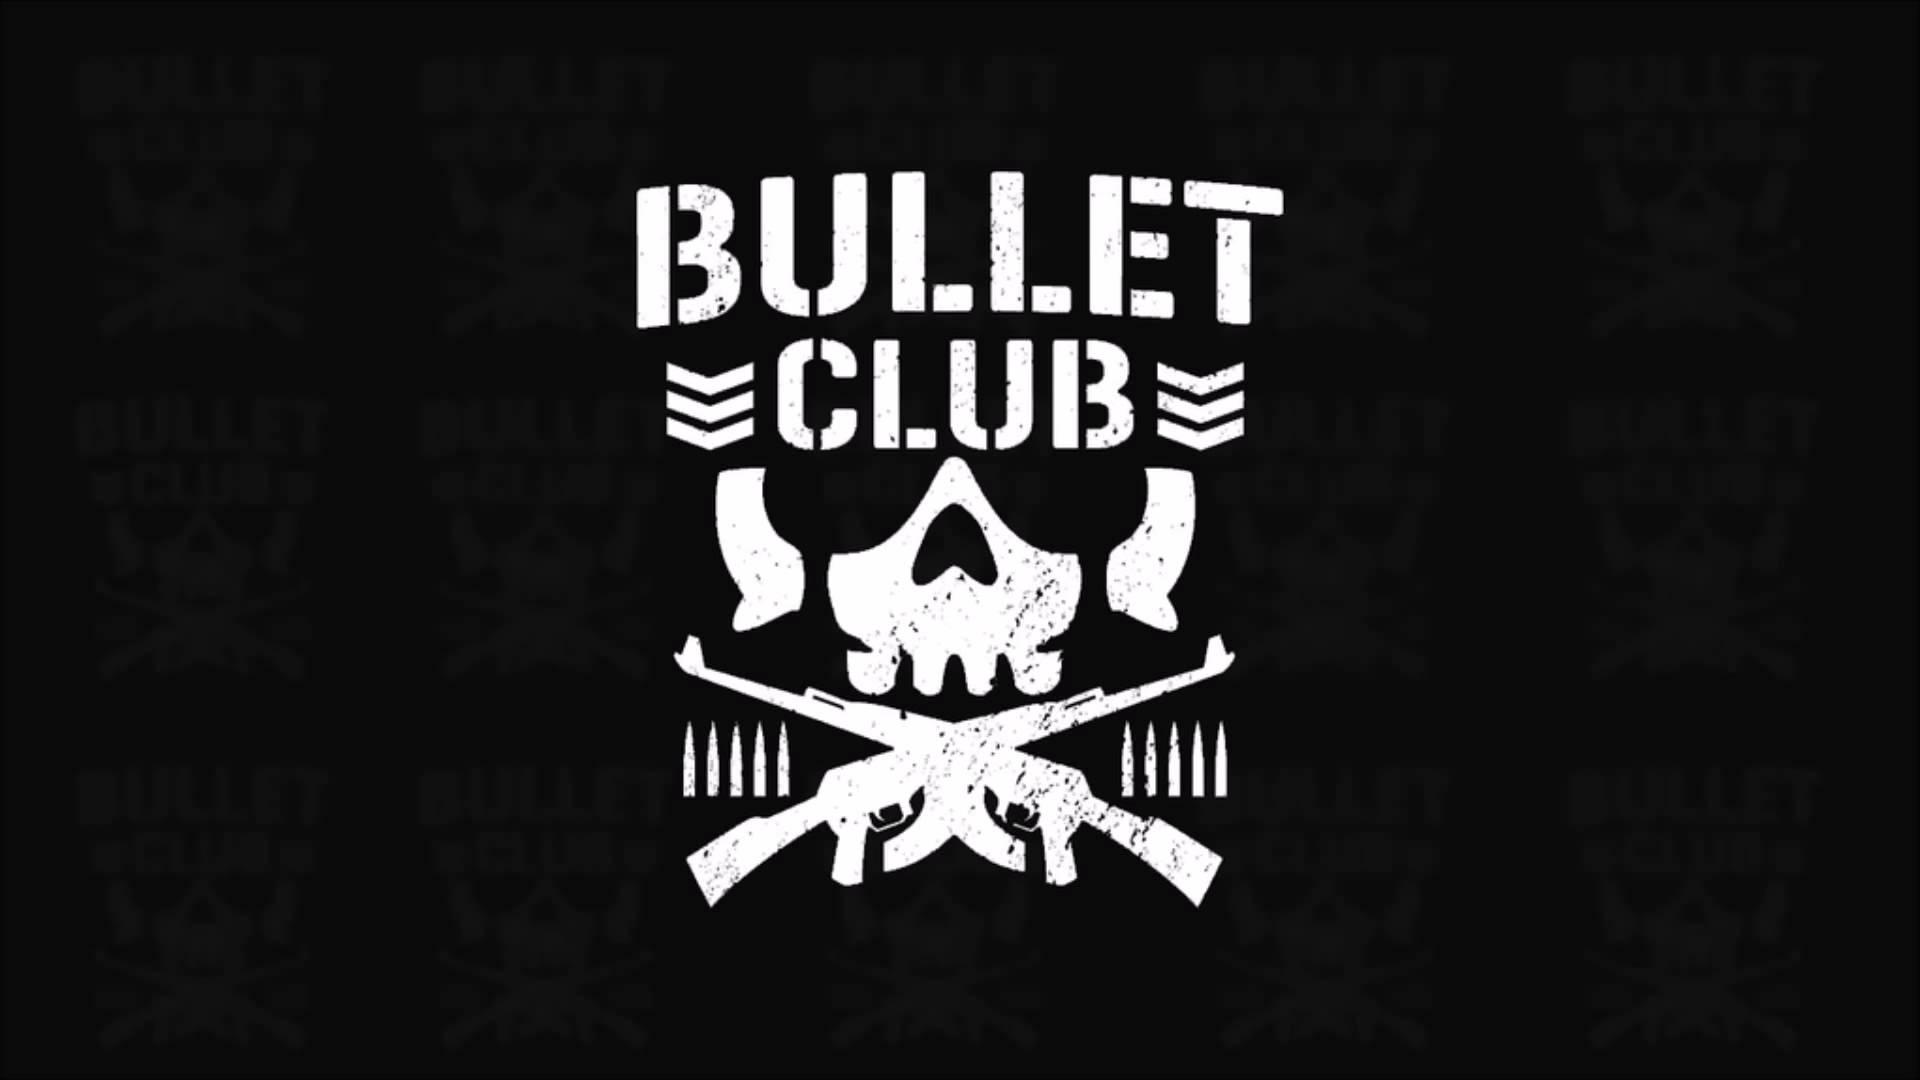 Bullet Club Wallpapers Wallpaper Cave